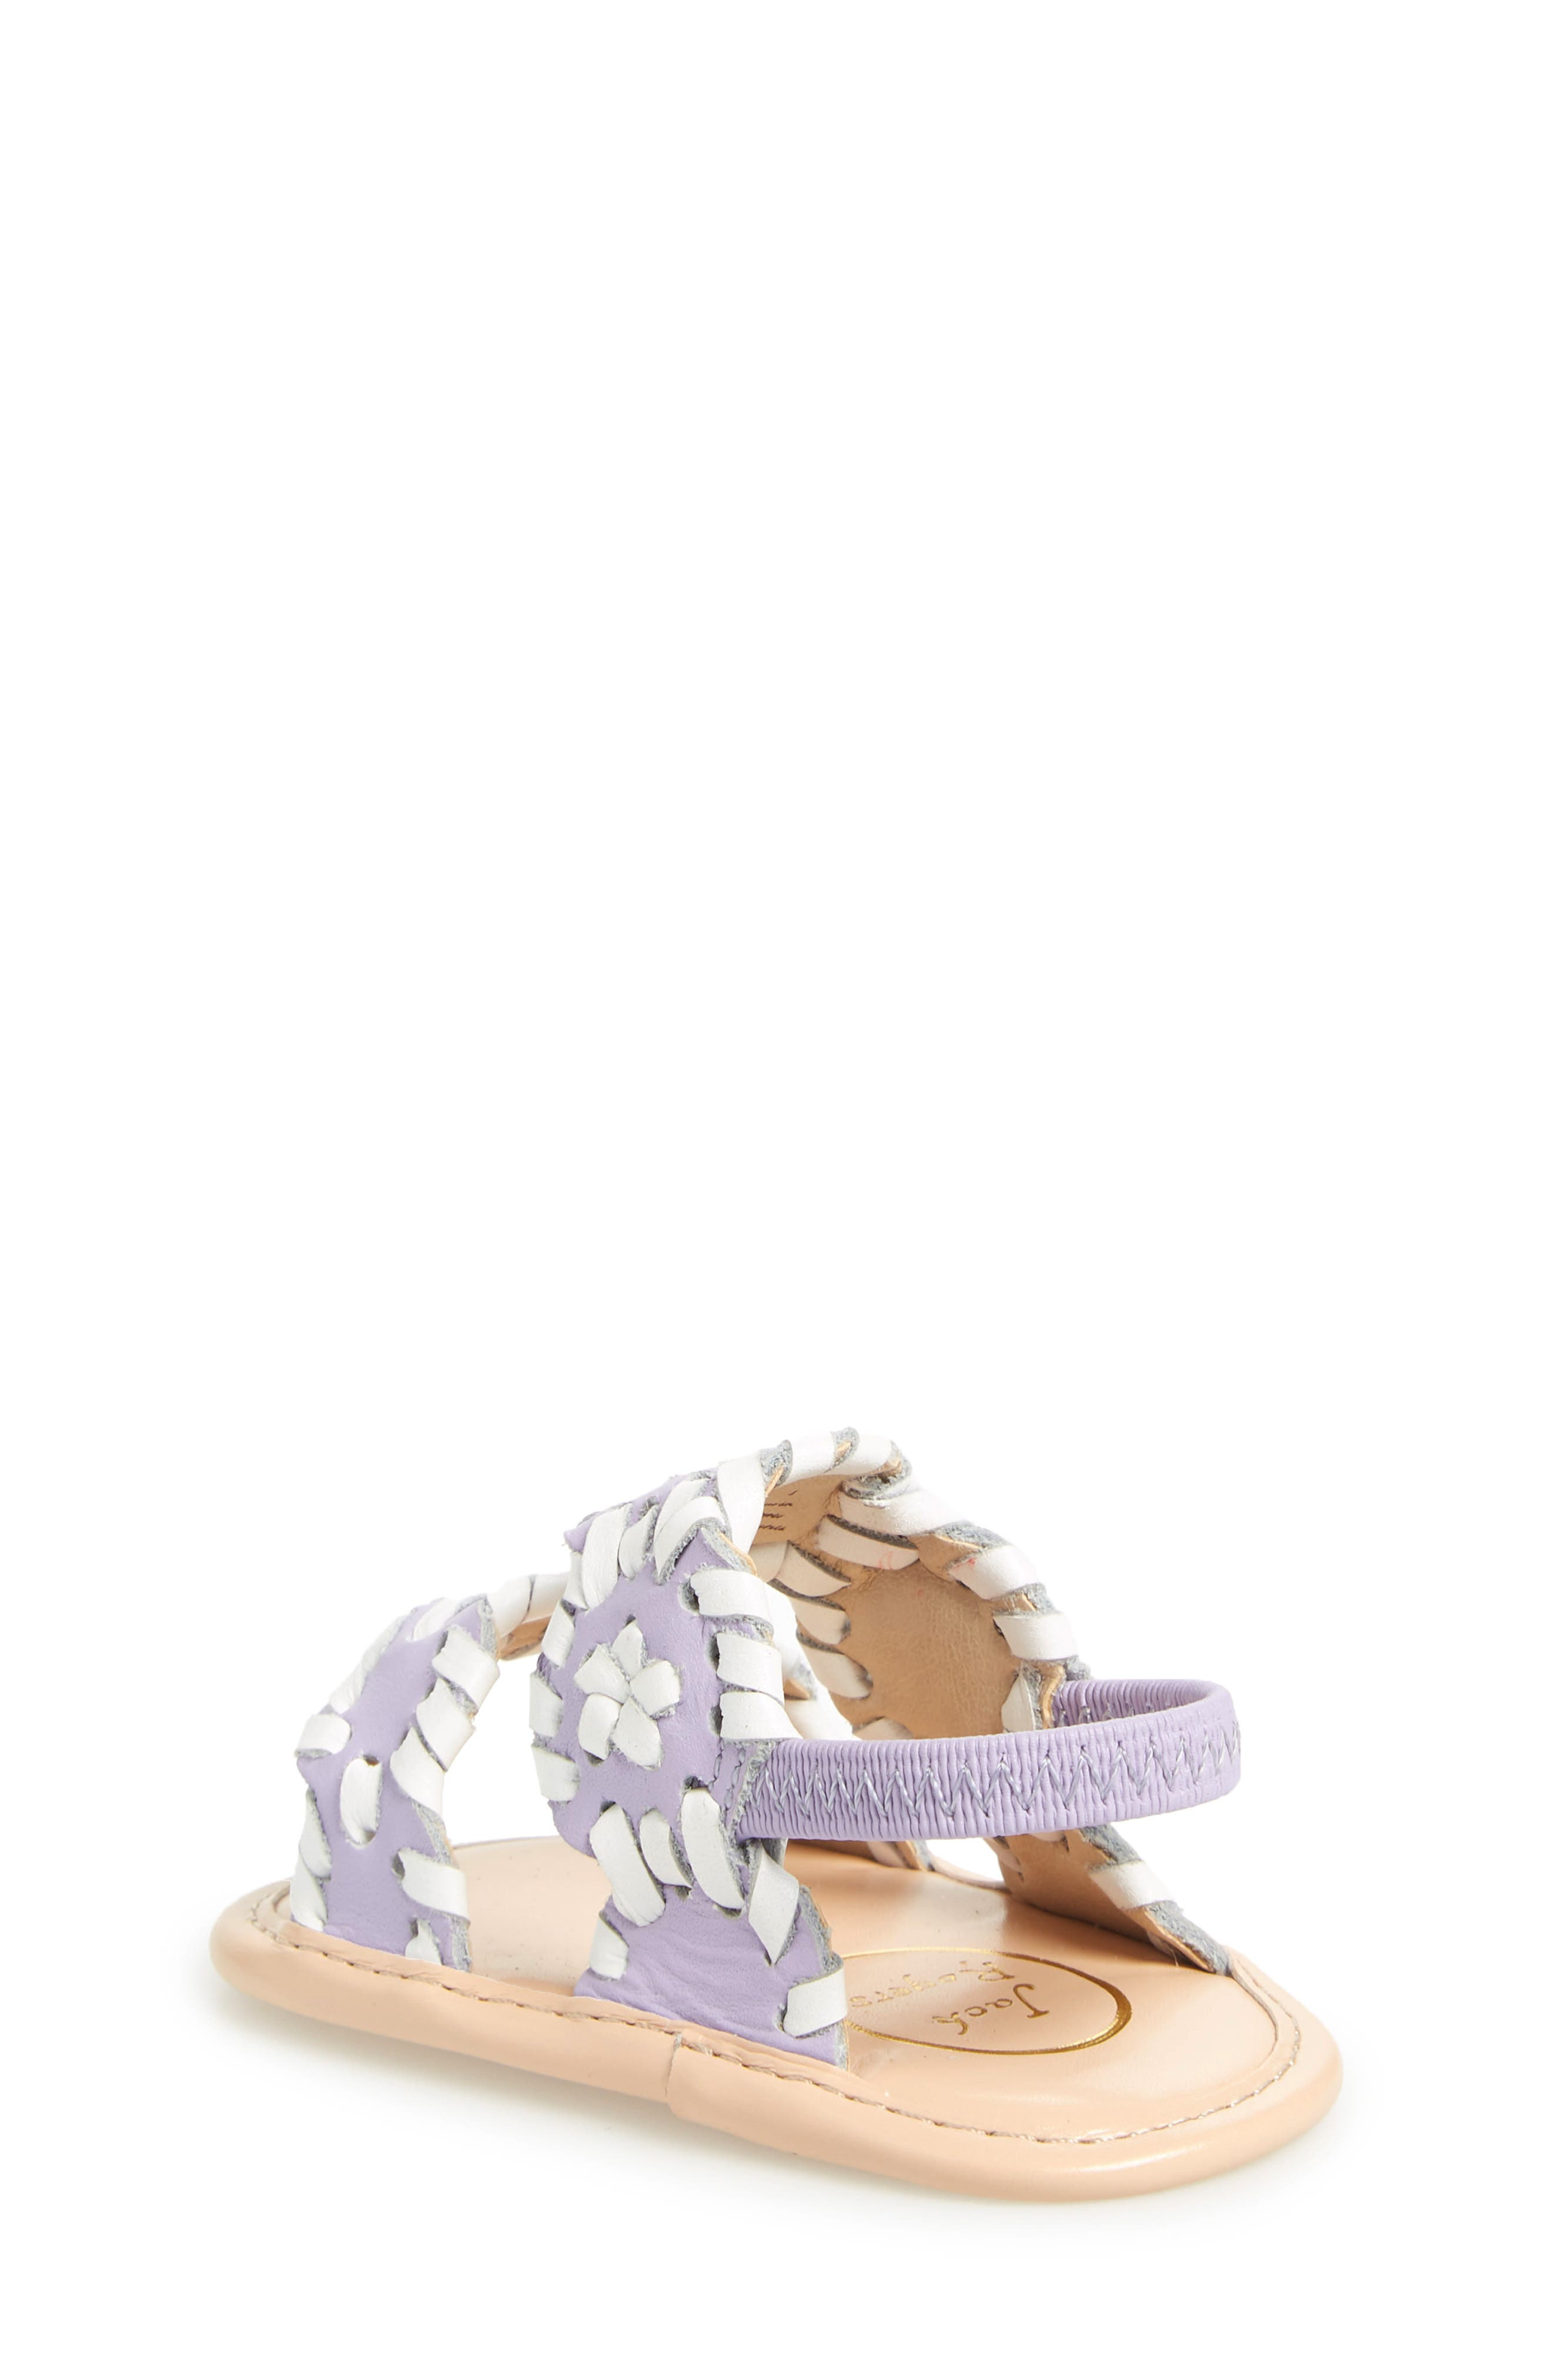 'Lauren' Sandal,                             Alternate thumbnail 2, color,                             Lilac/ White Leather